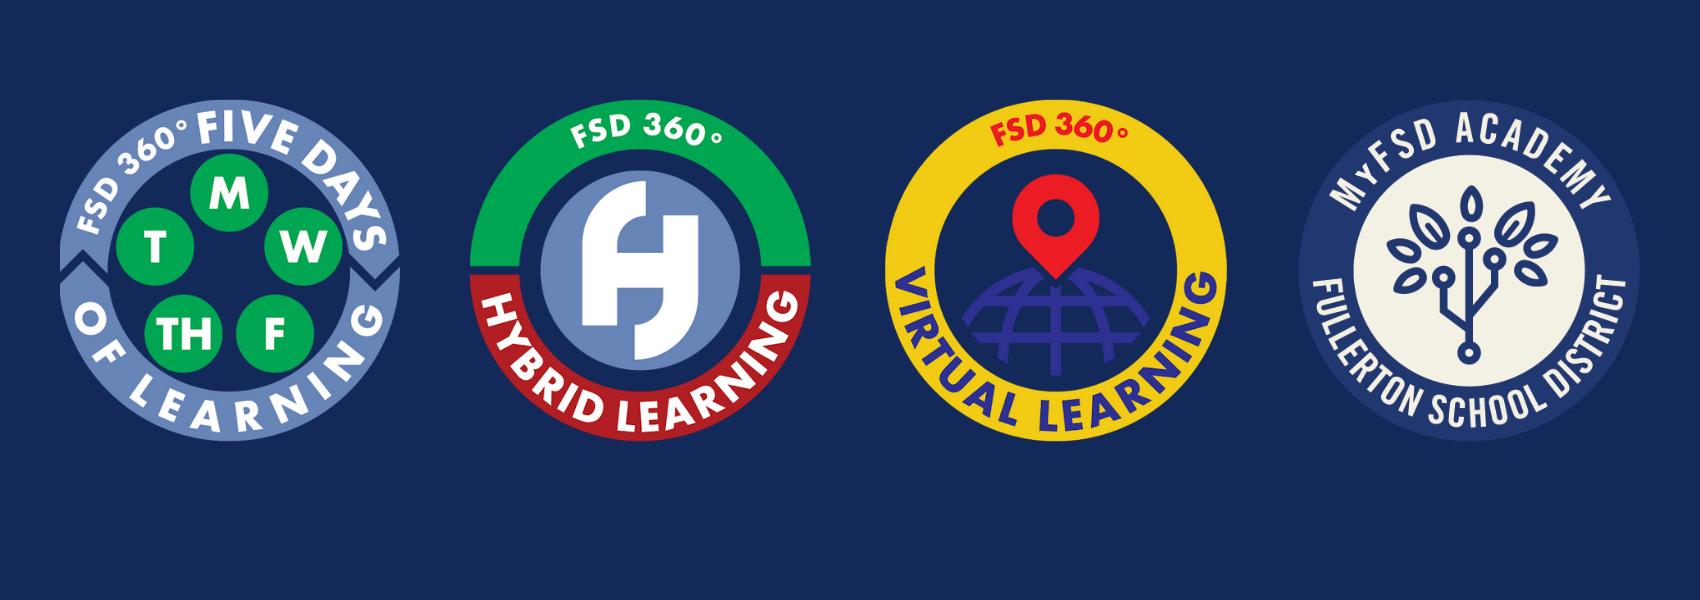 FSD Learning Options